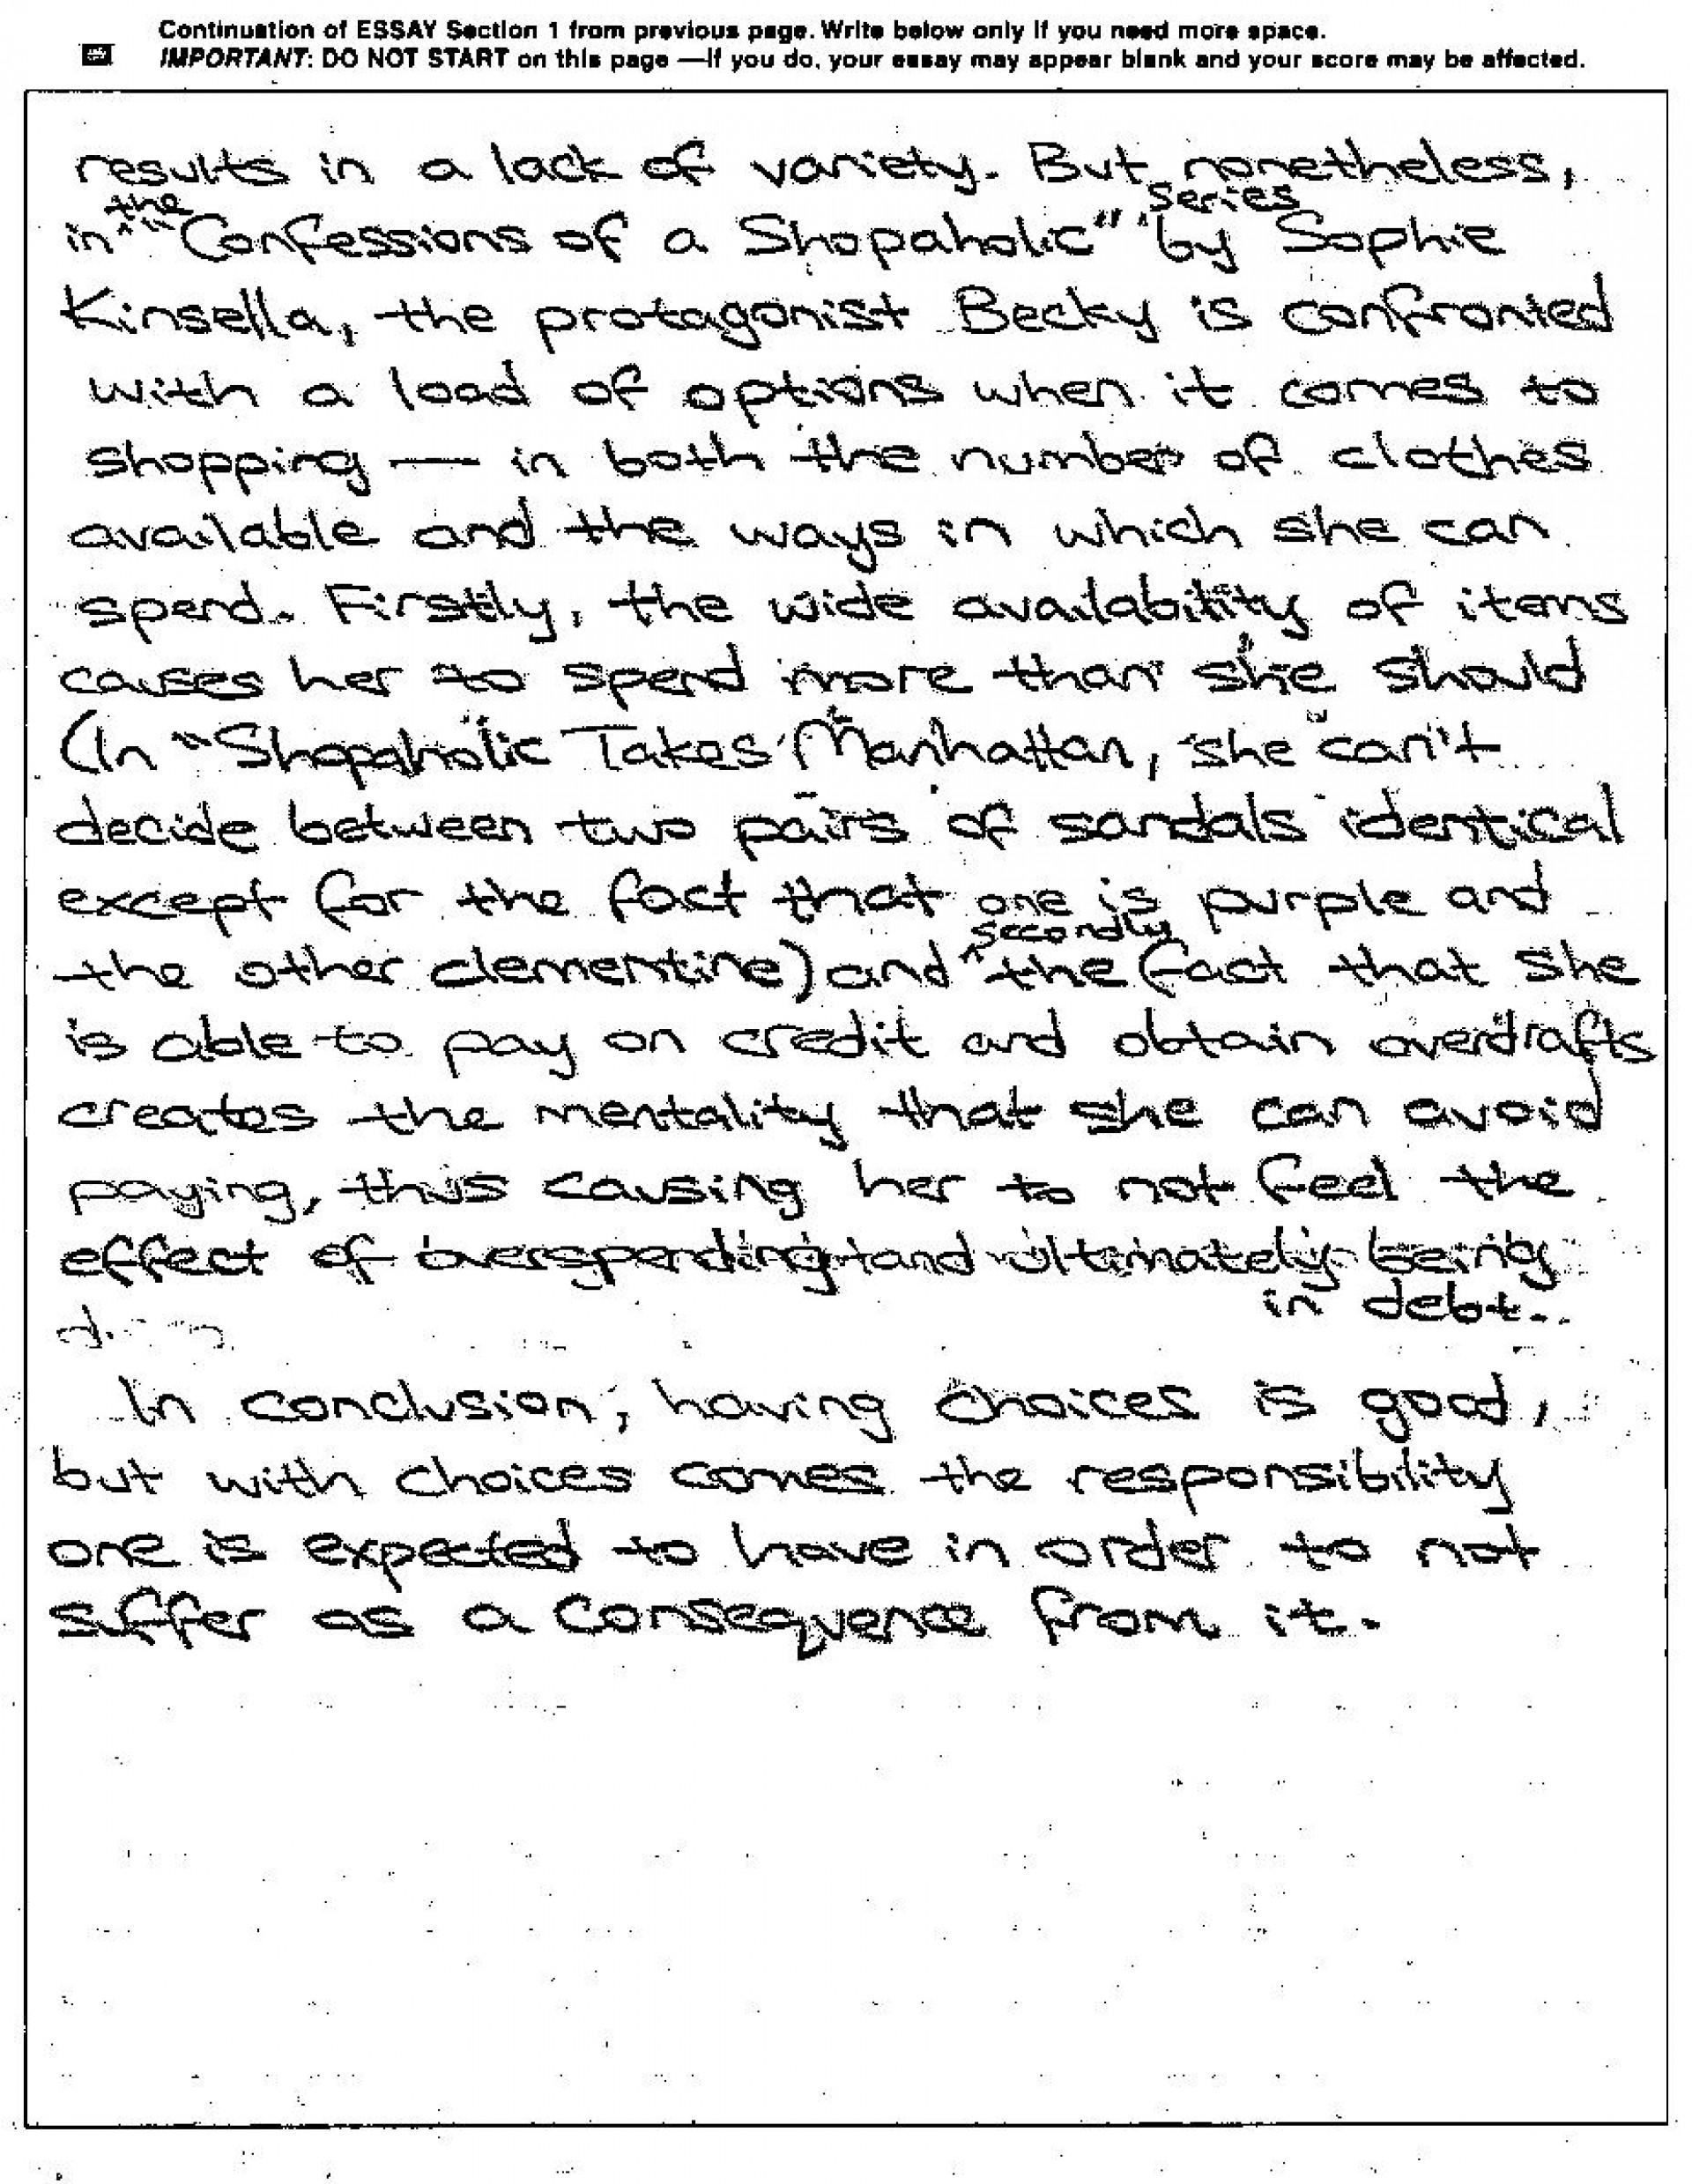 006 Essay Example Sat Tips Singular Pdf Writing Prepscholar 1920